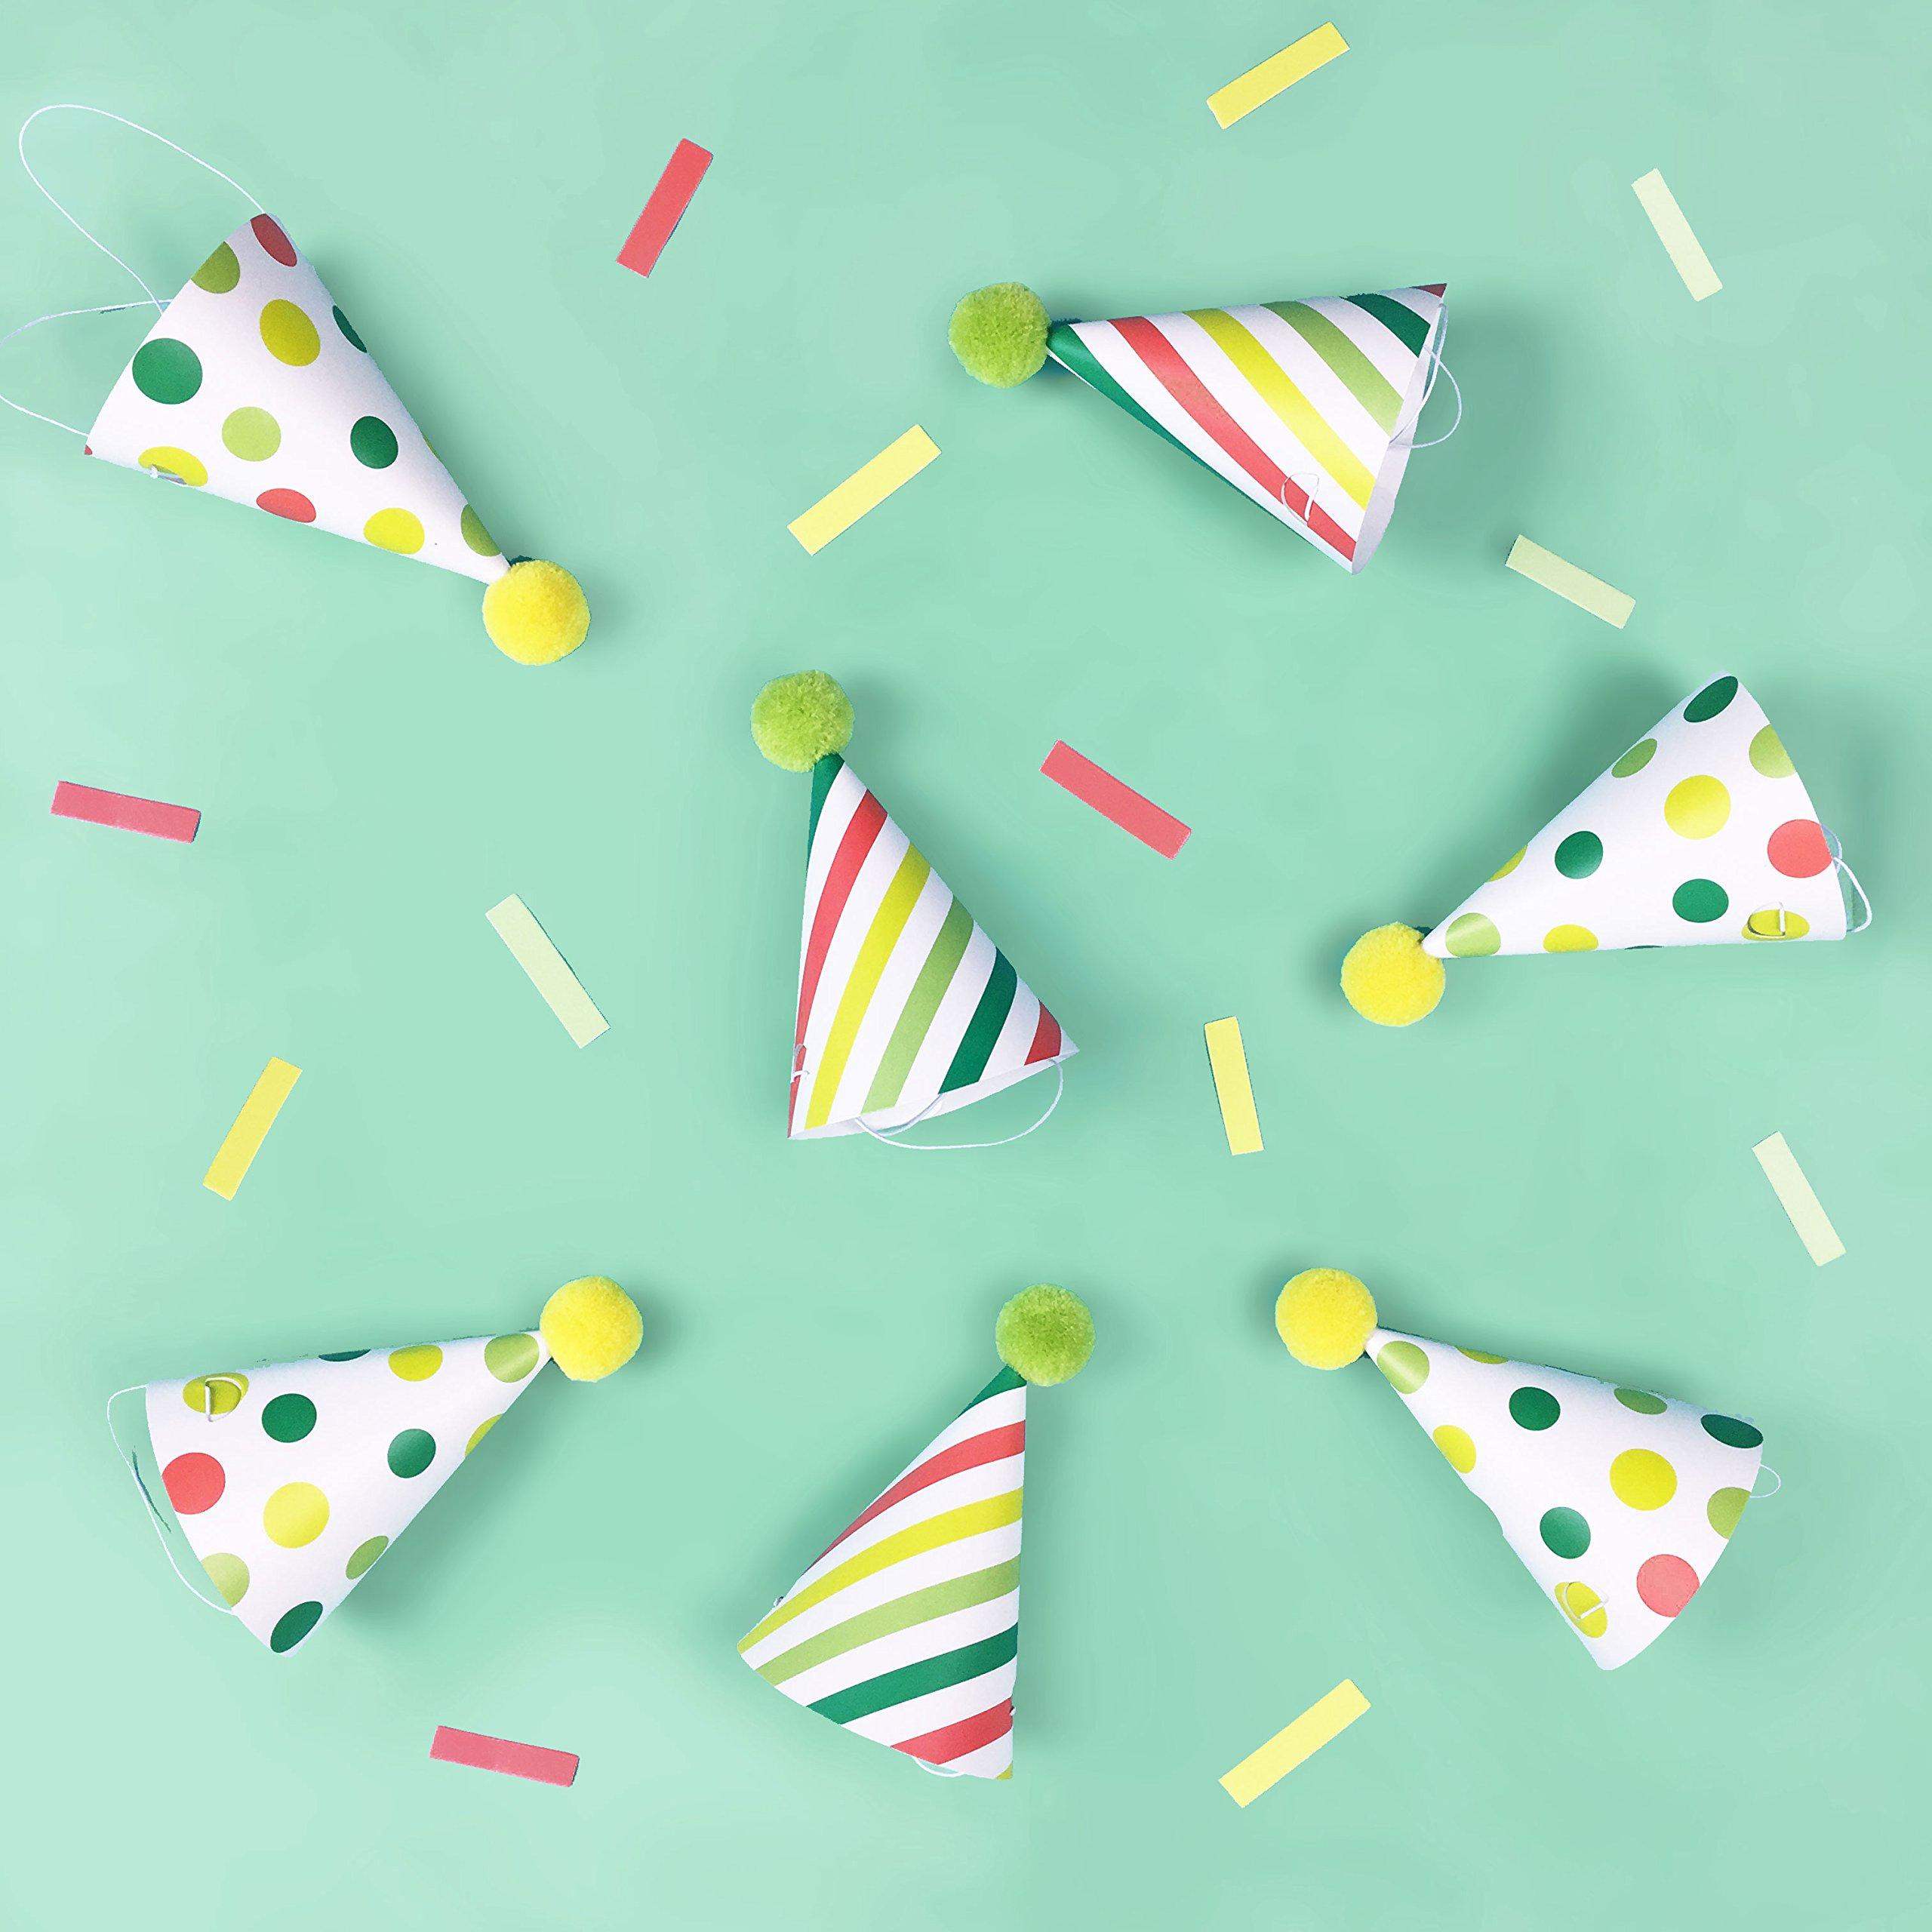 Llama Party - Mini Party Hats   12 Pack   Party Hats   Polka Dots, Stripes   Pom Pom Hat   Birthday Party